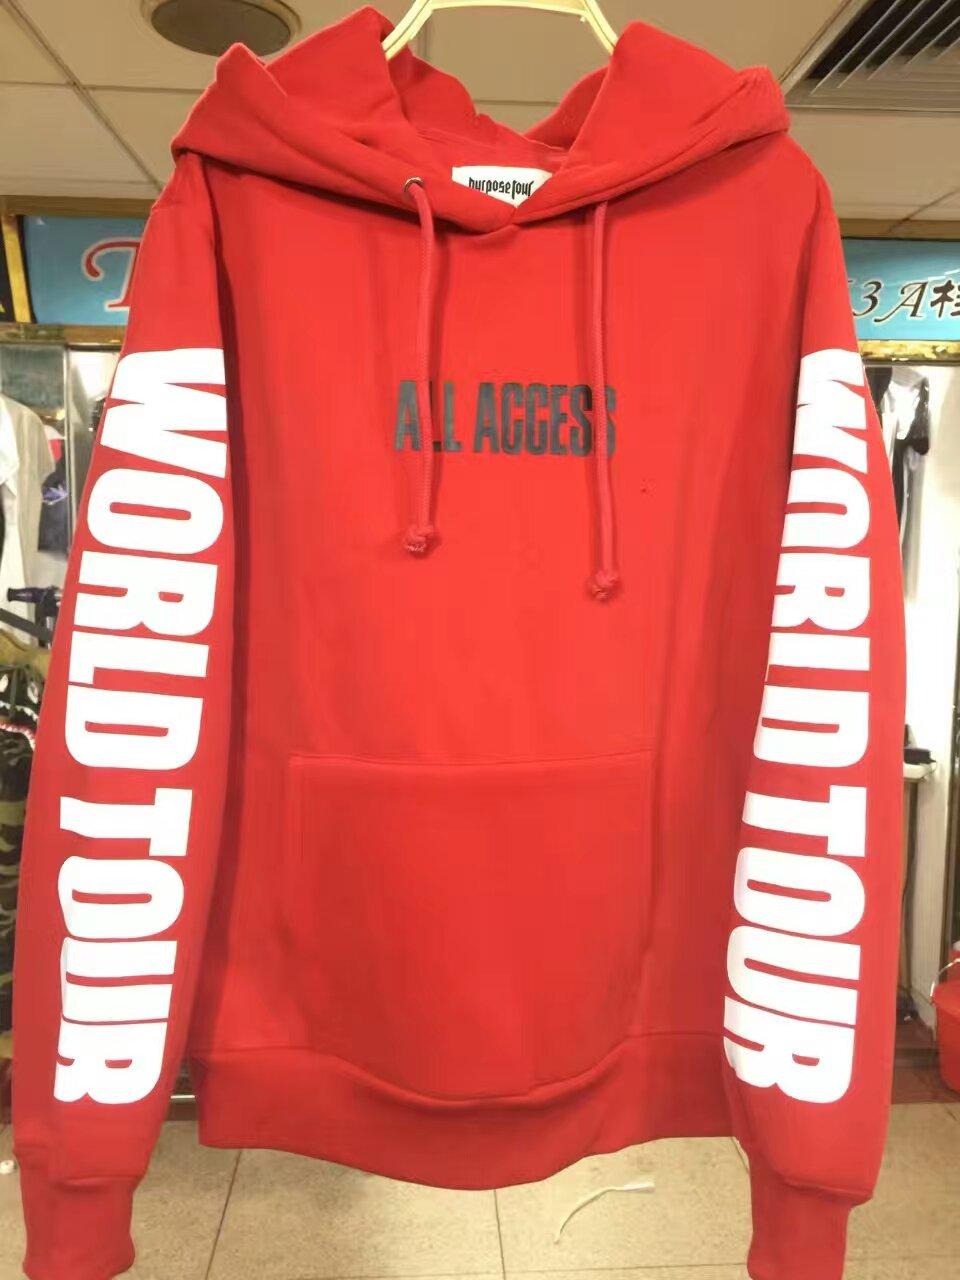 2017 justin bieber world tour Autumn winter purpose tour merchandise All Acces Print fleece men red hoodie